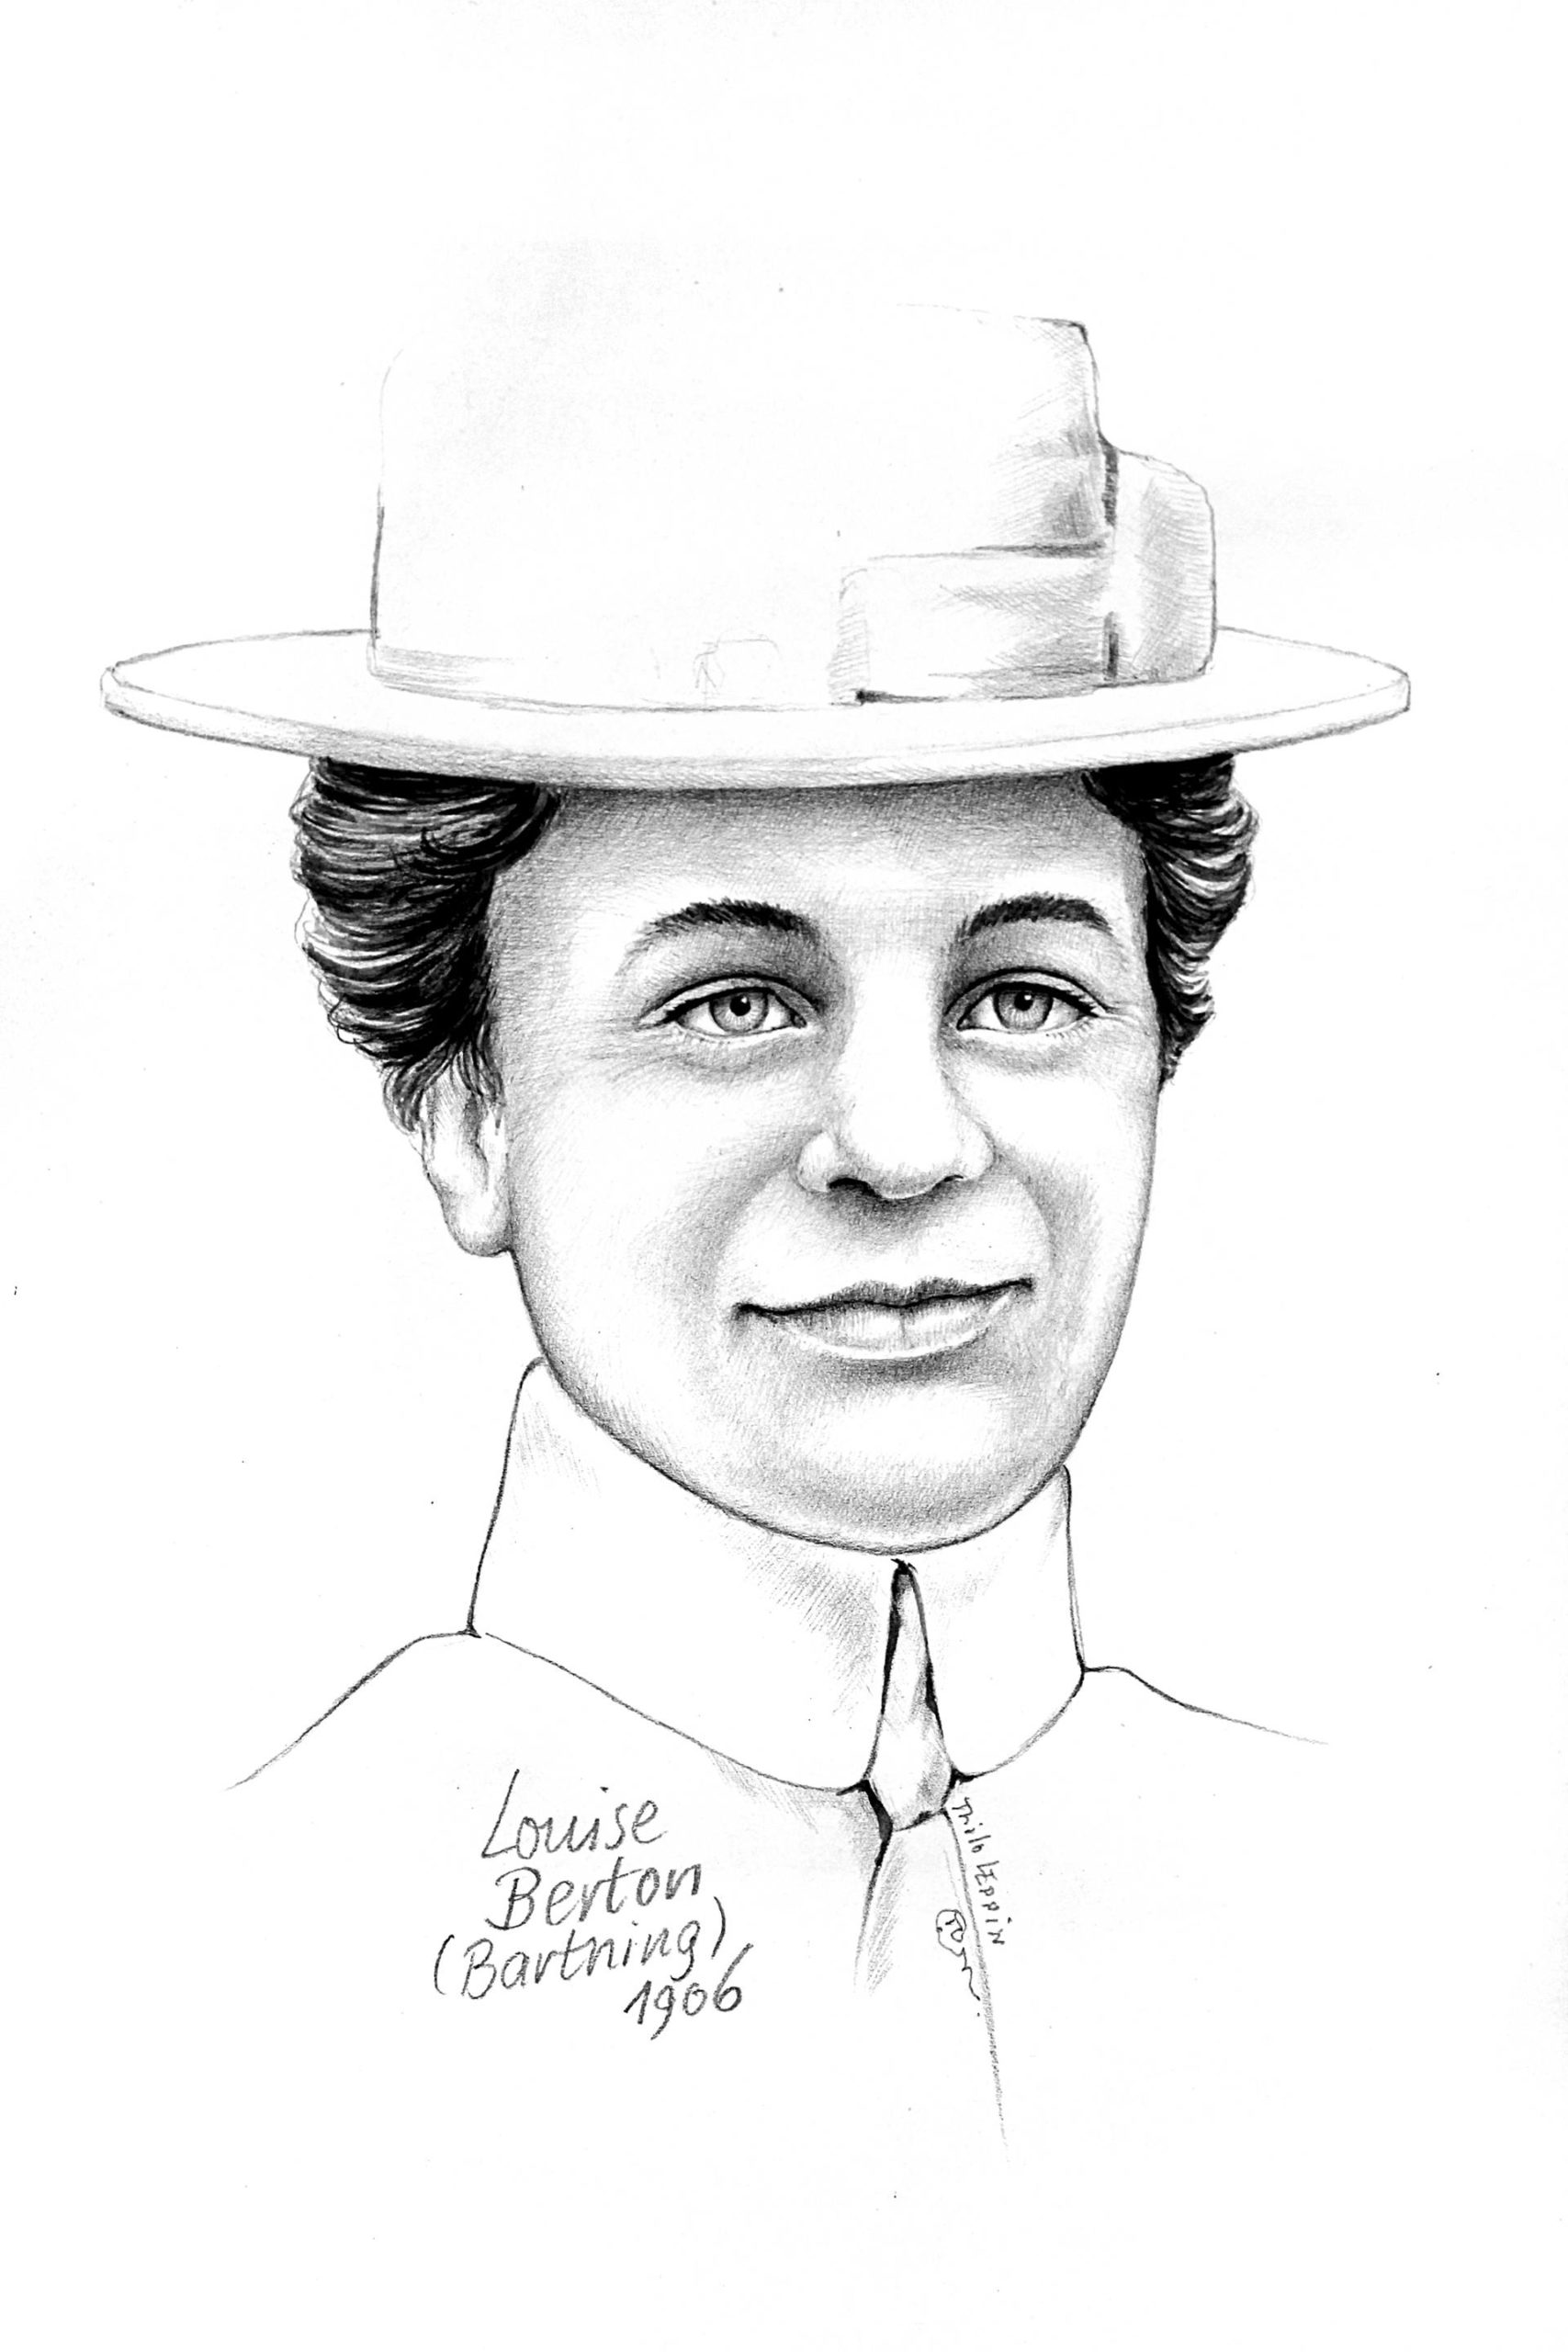 Luise Berton